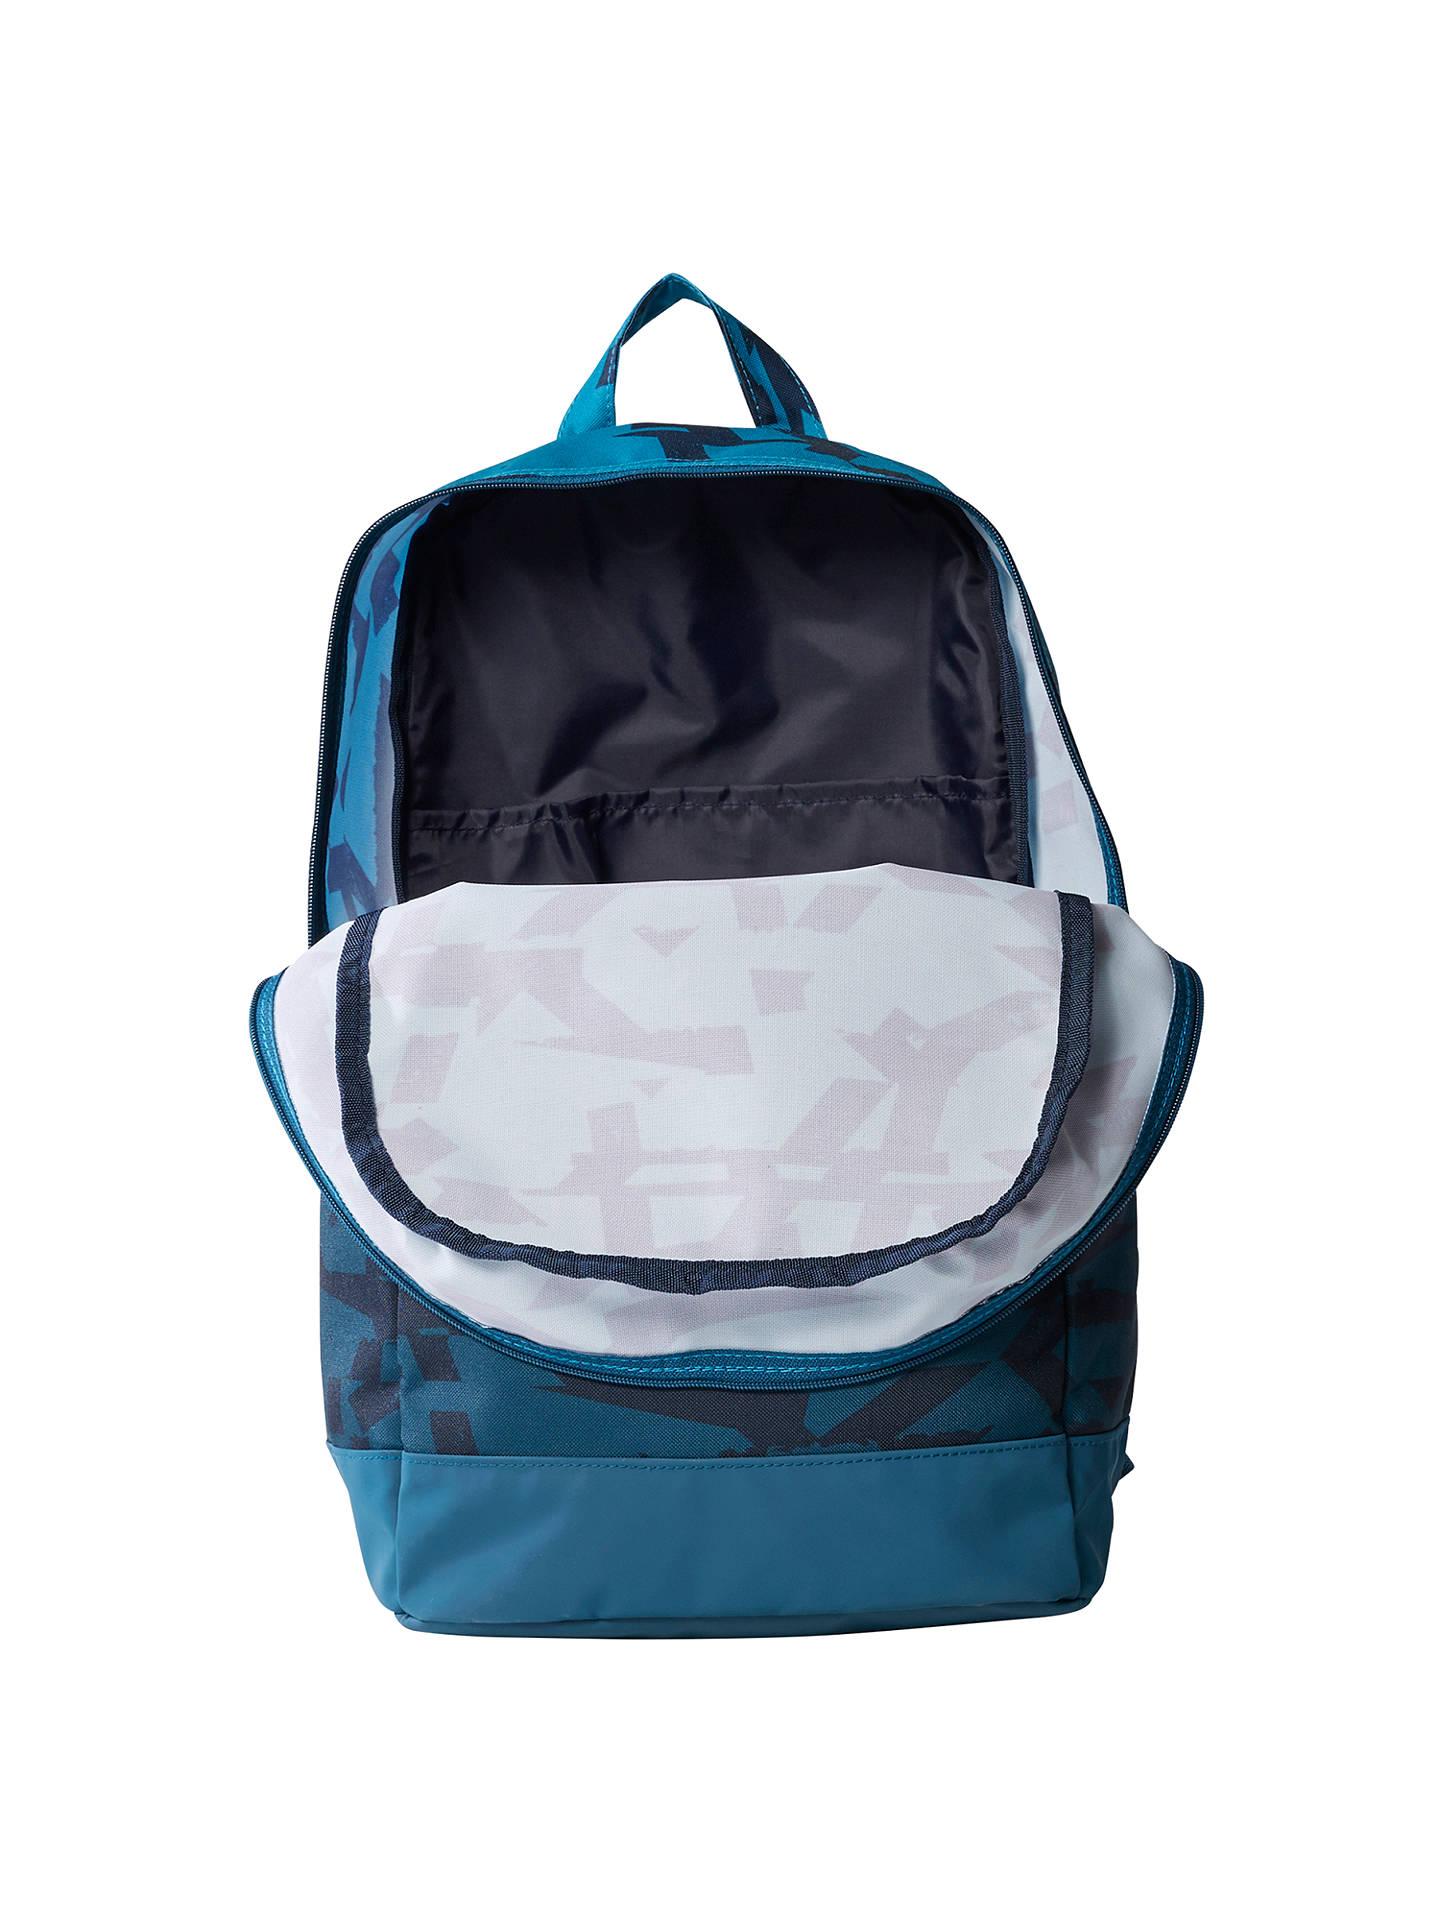 6b781beaeca5 adidas Classic Graphic Backpack, Medium, Blue at John Lewis & Partners